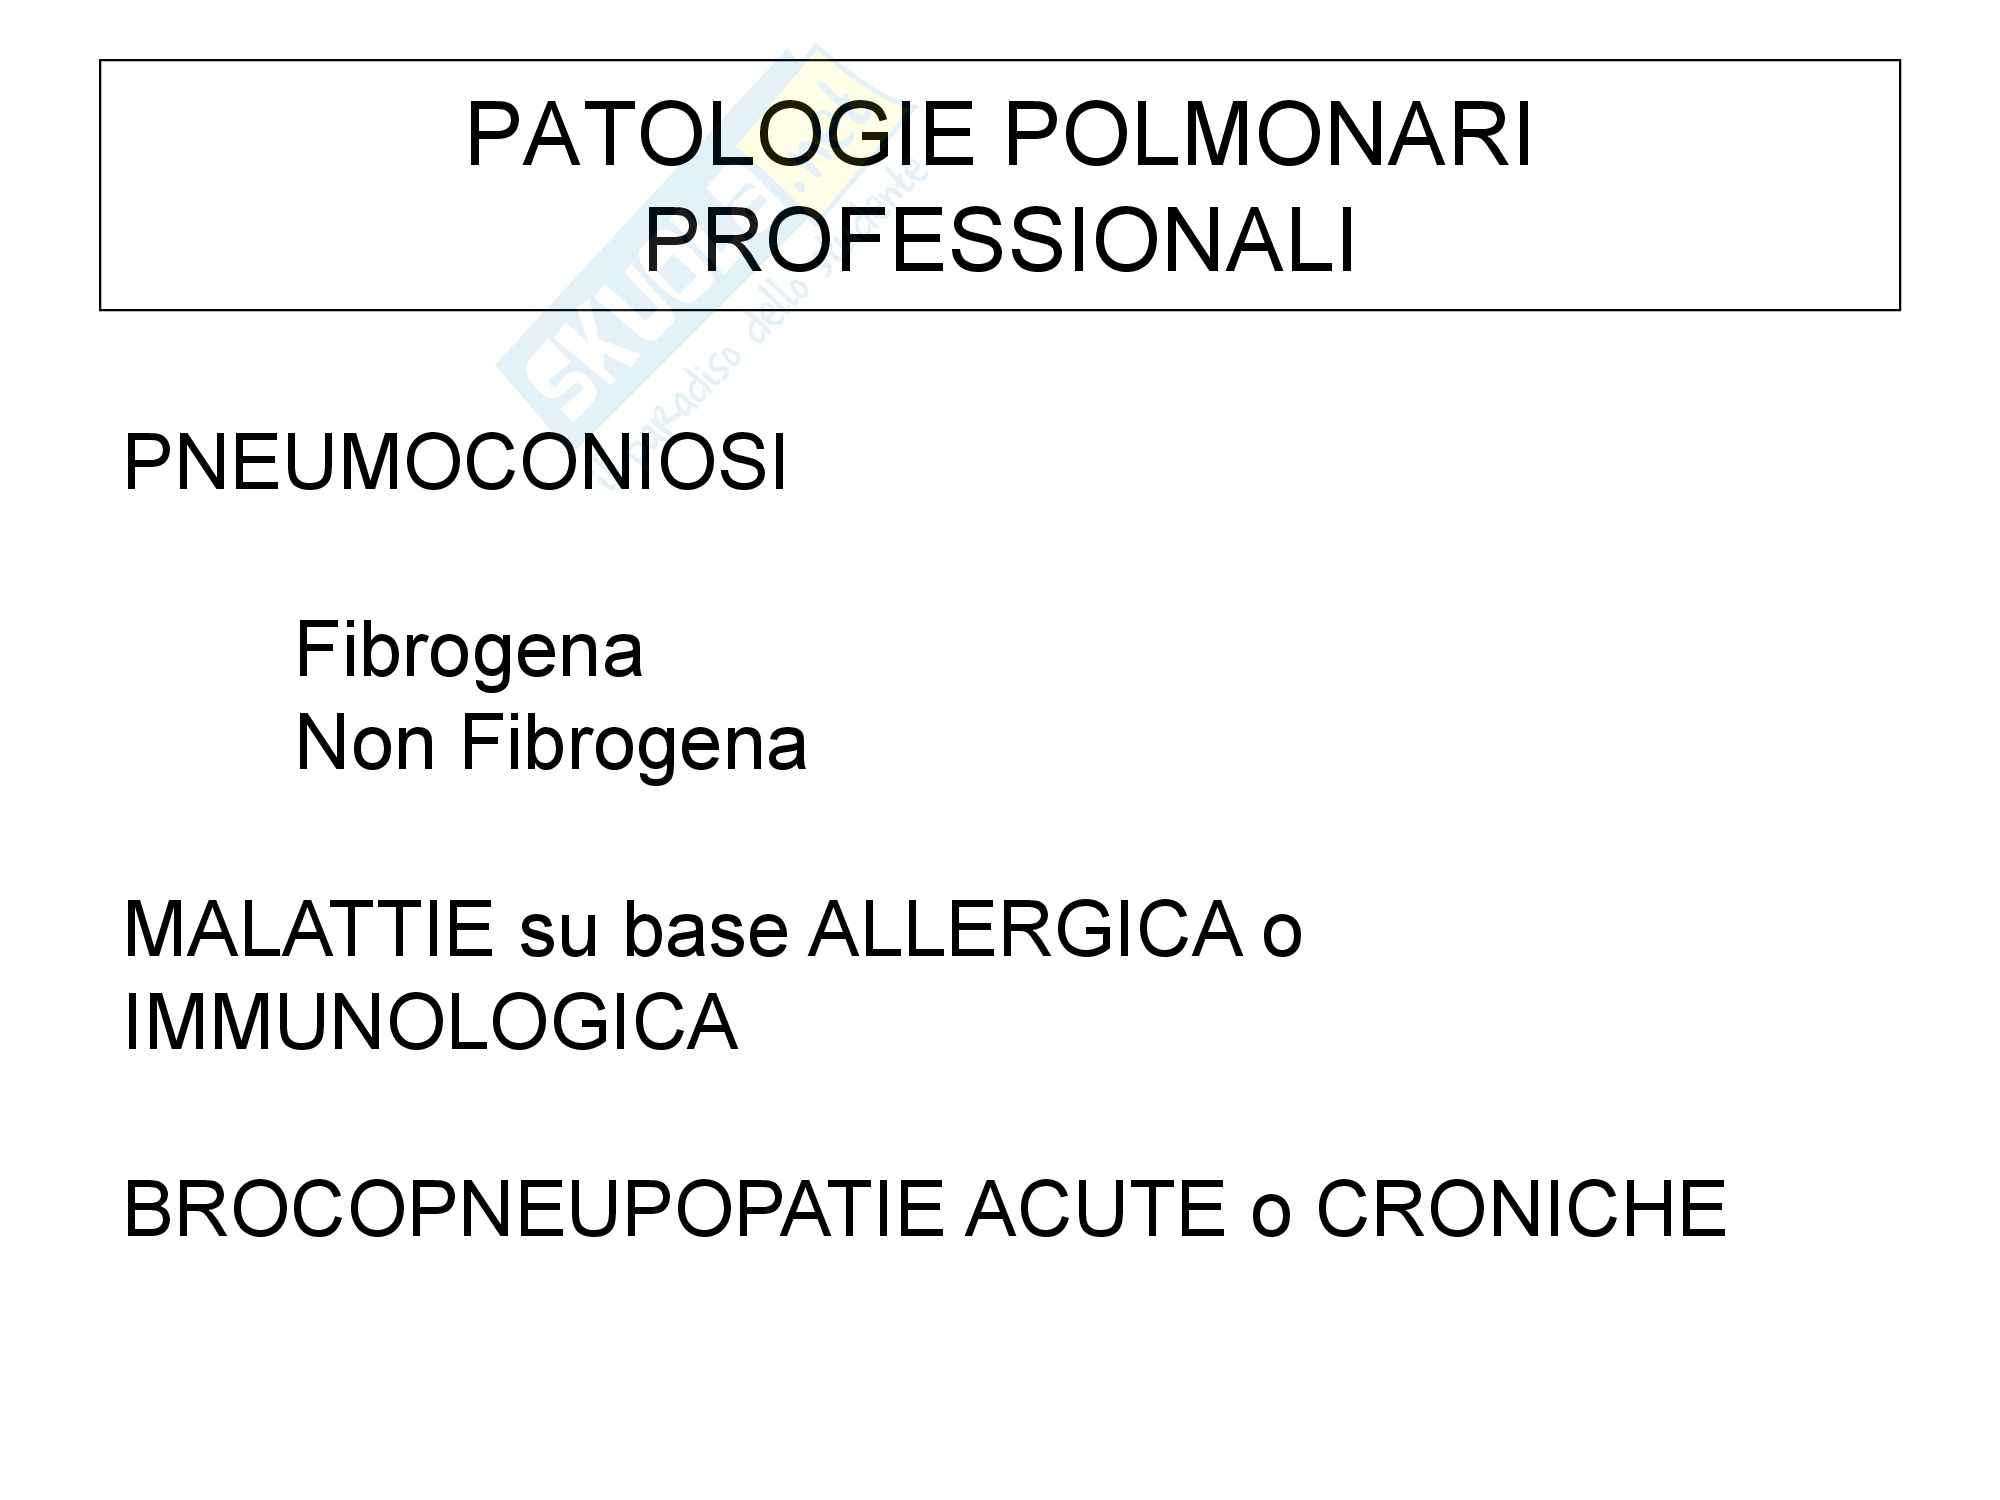 Patologie polmonari - Parte 2